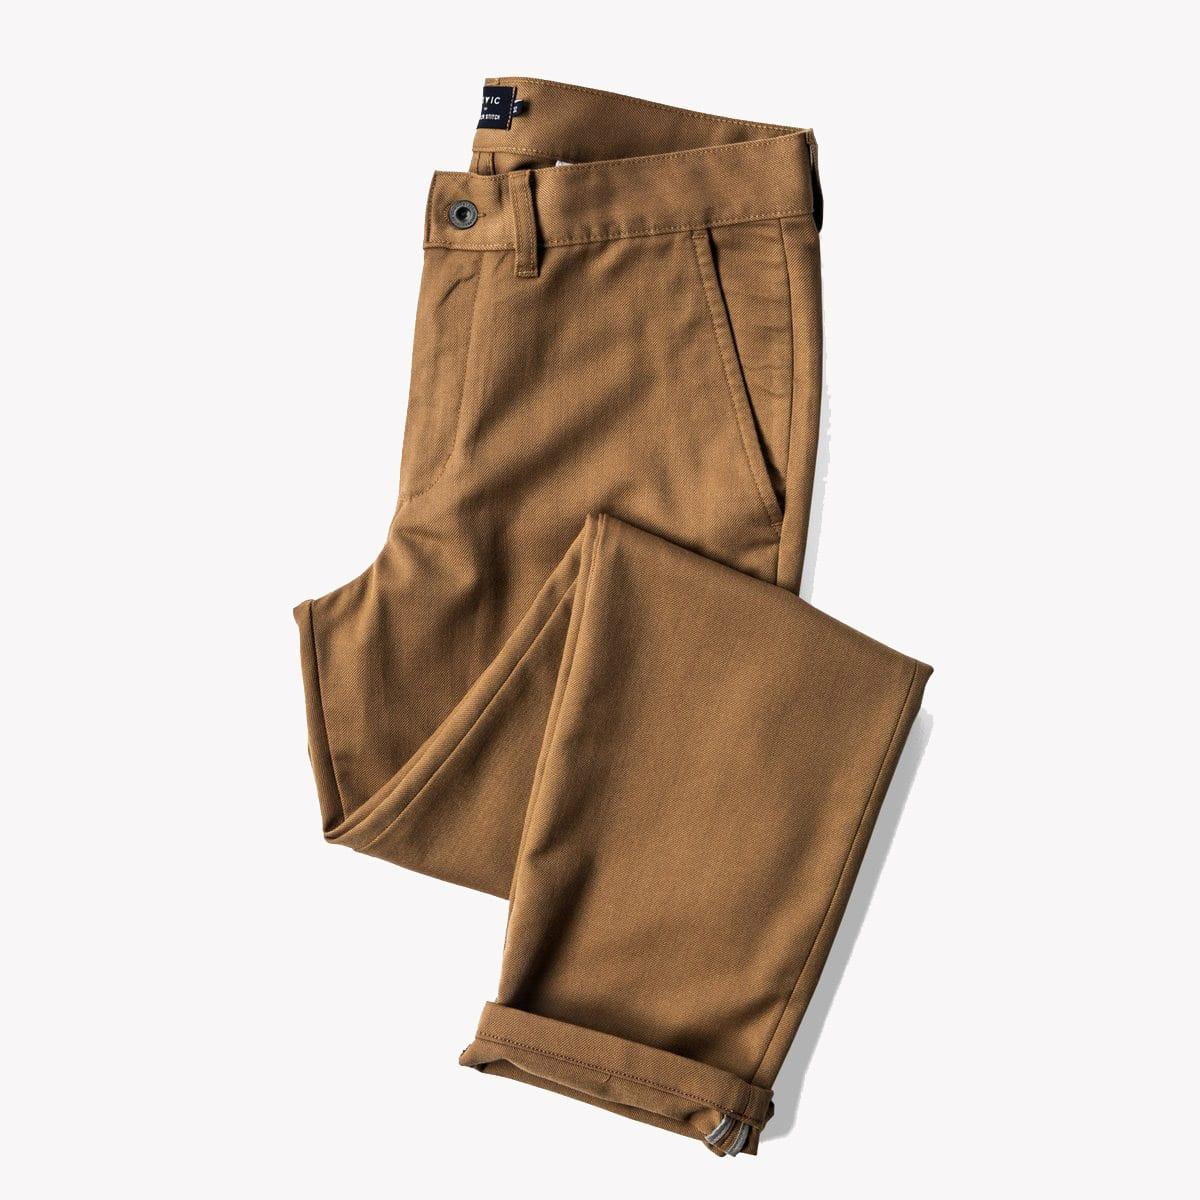 d24936d360a37 Best Merino Wool Brands for Travel in 2019 - Tortuga Backpacks Blog